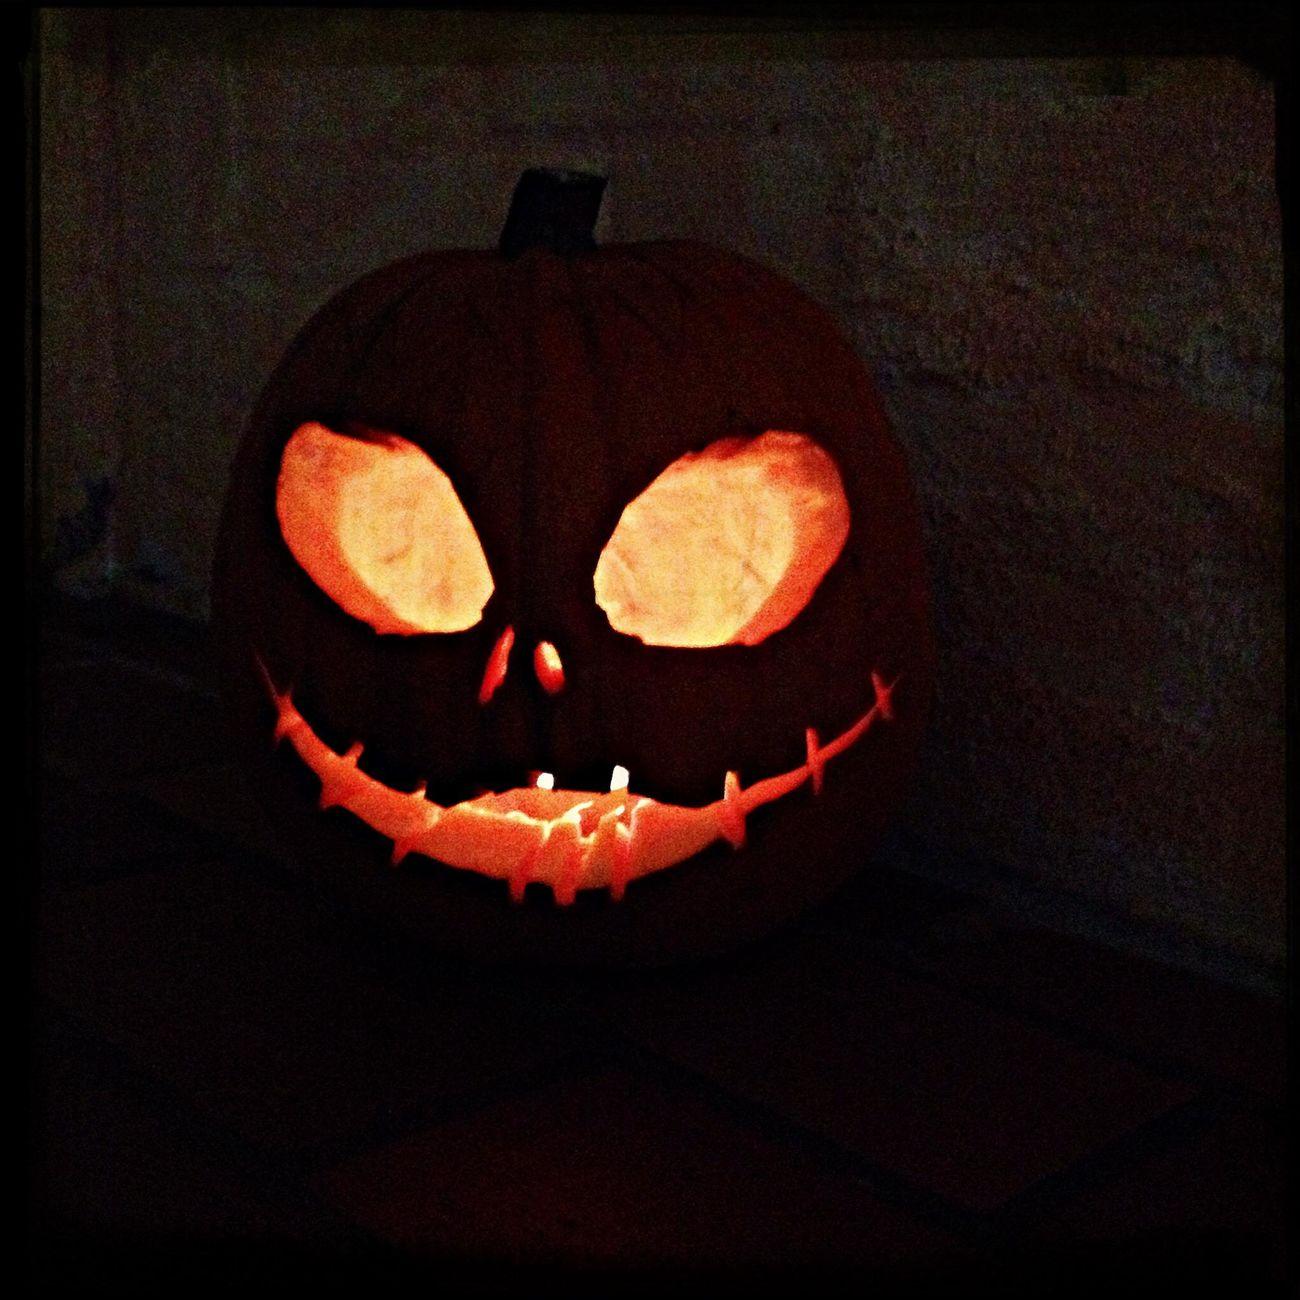 Happy Haloween, I no it's not jet, but I made a Pumpkin Head for fun! Jack Skeleton Tim Burton Haloween Pumpkins